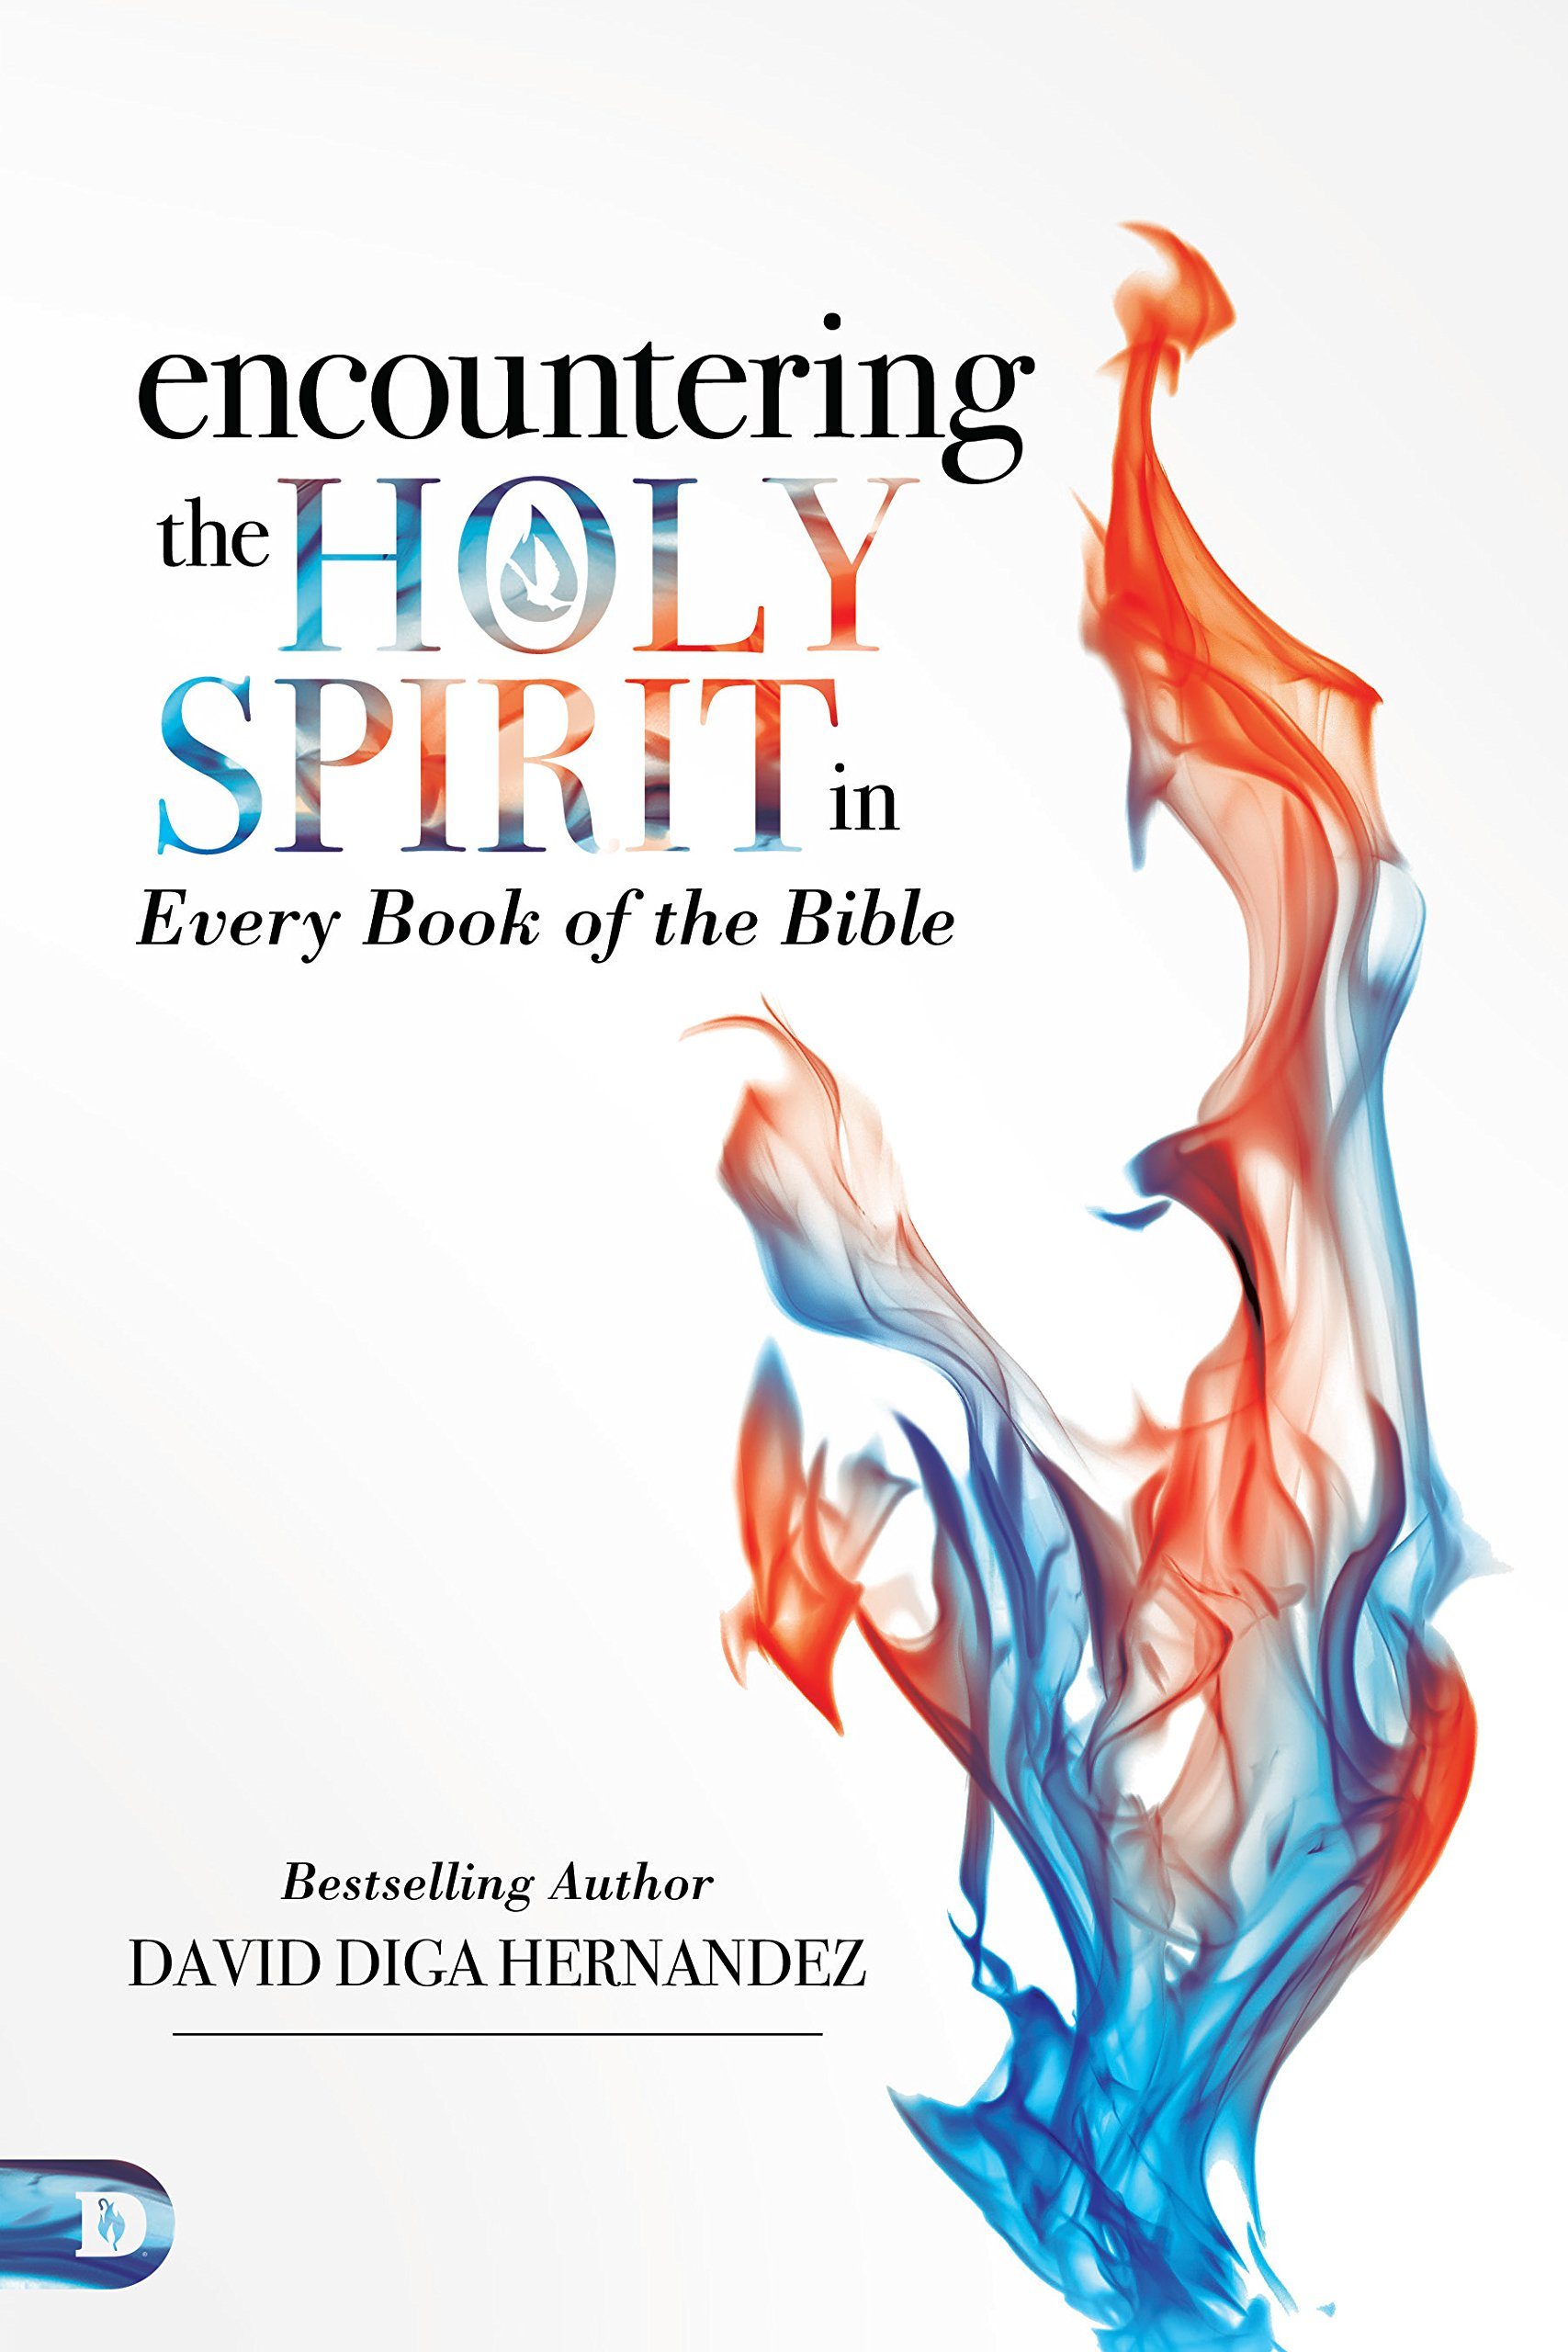 Encountering Holy Spirit Every Bible